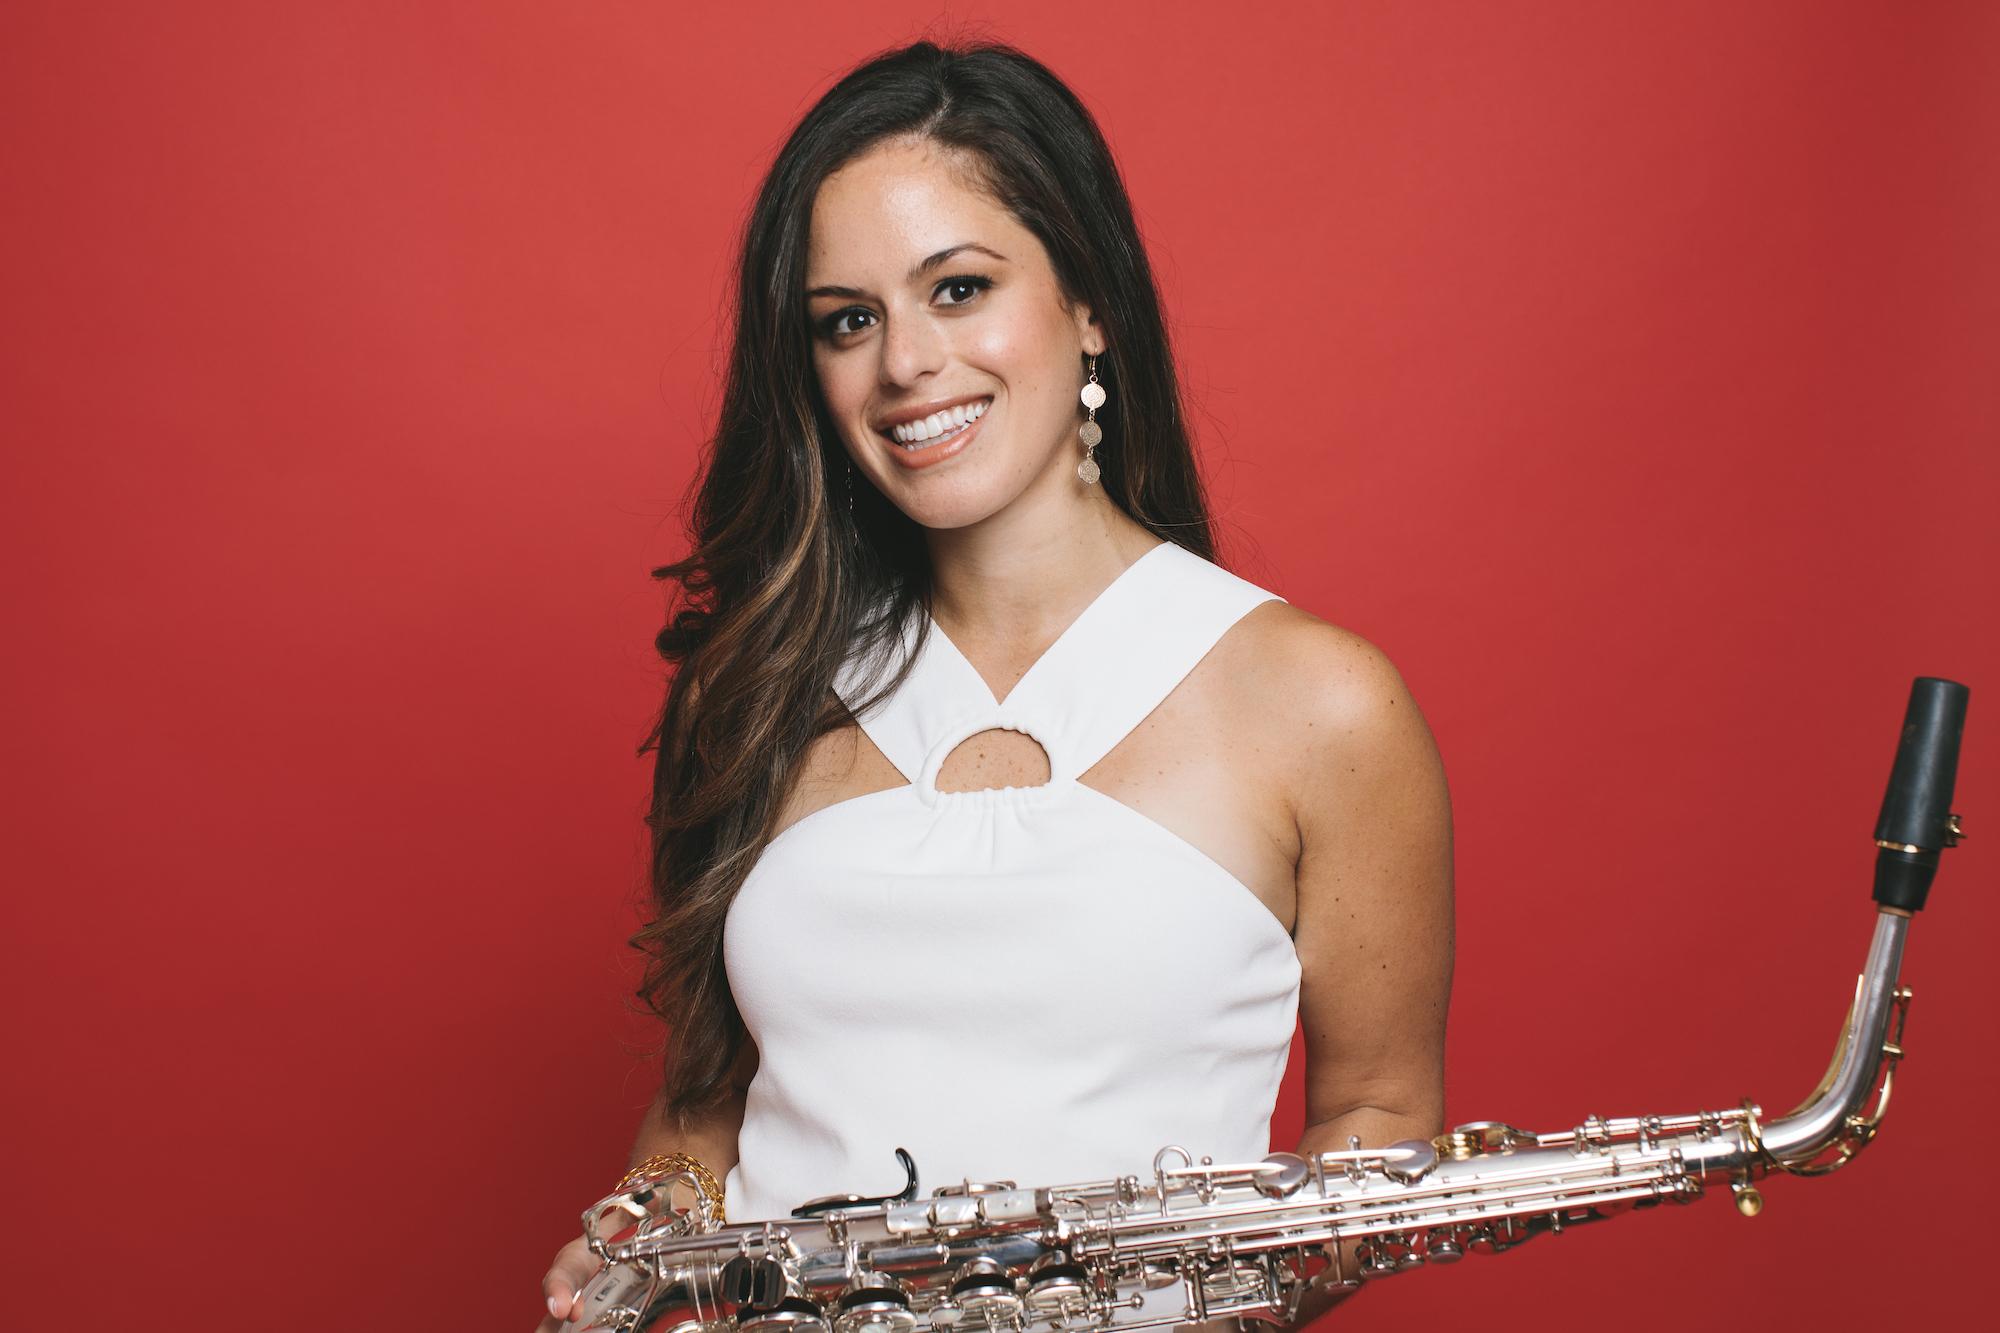 Alexa tarantino holding alto saxophone smiling in white dress with orange background